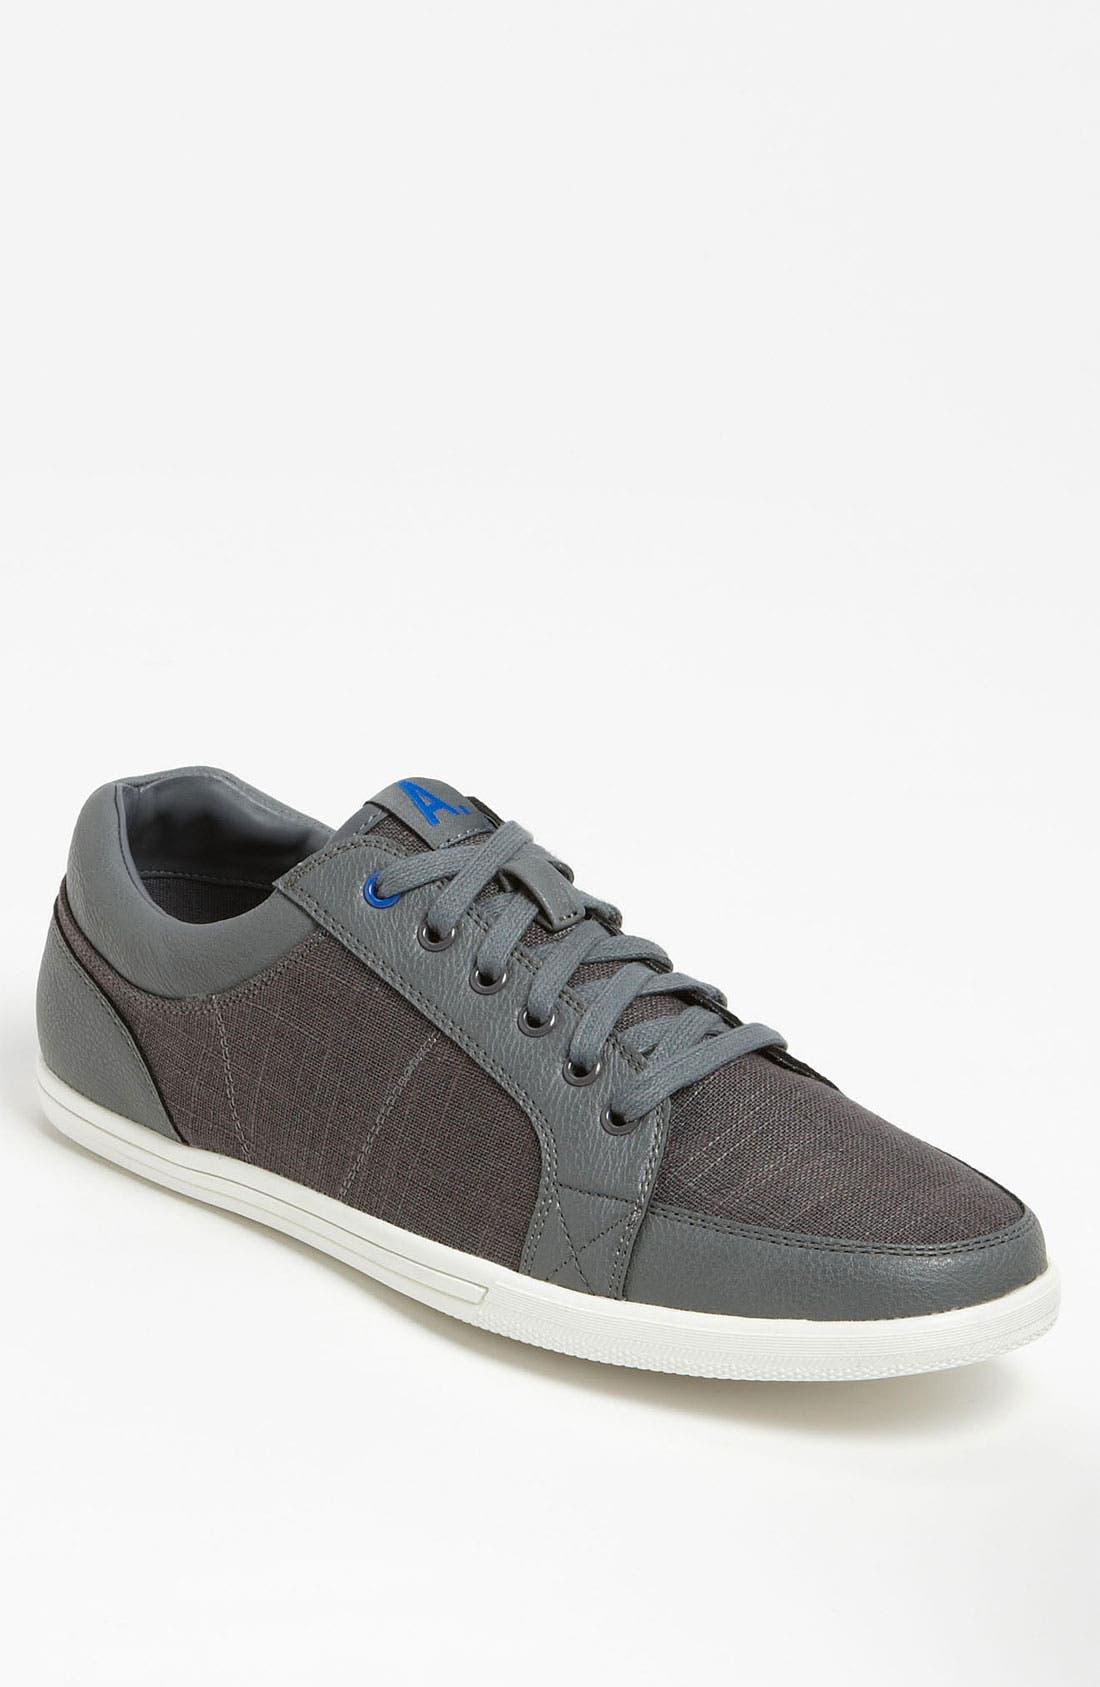 Alternate Image 1 Selected - ALDO 'Ensor' Sneaker